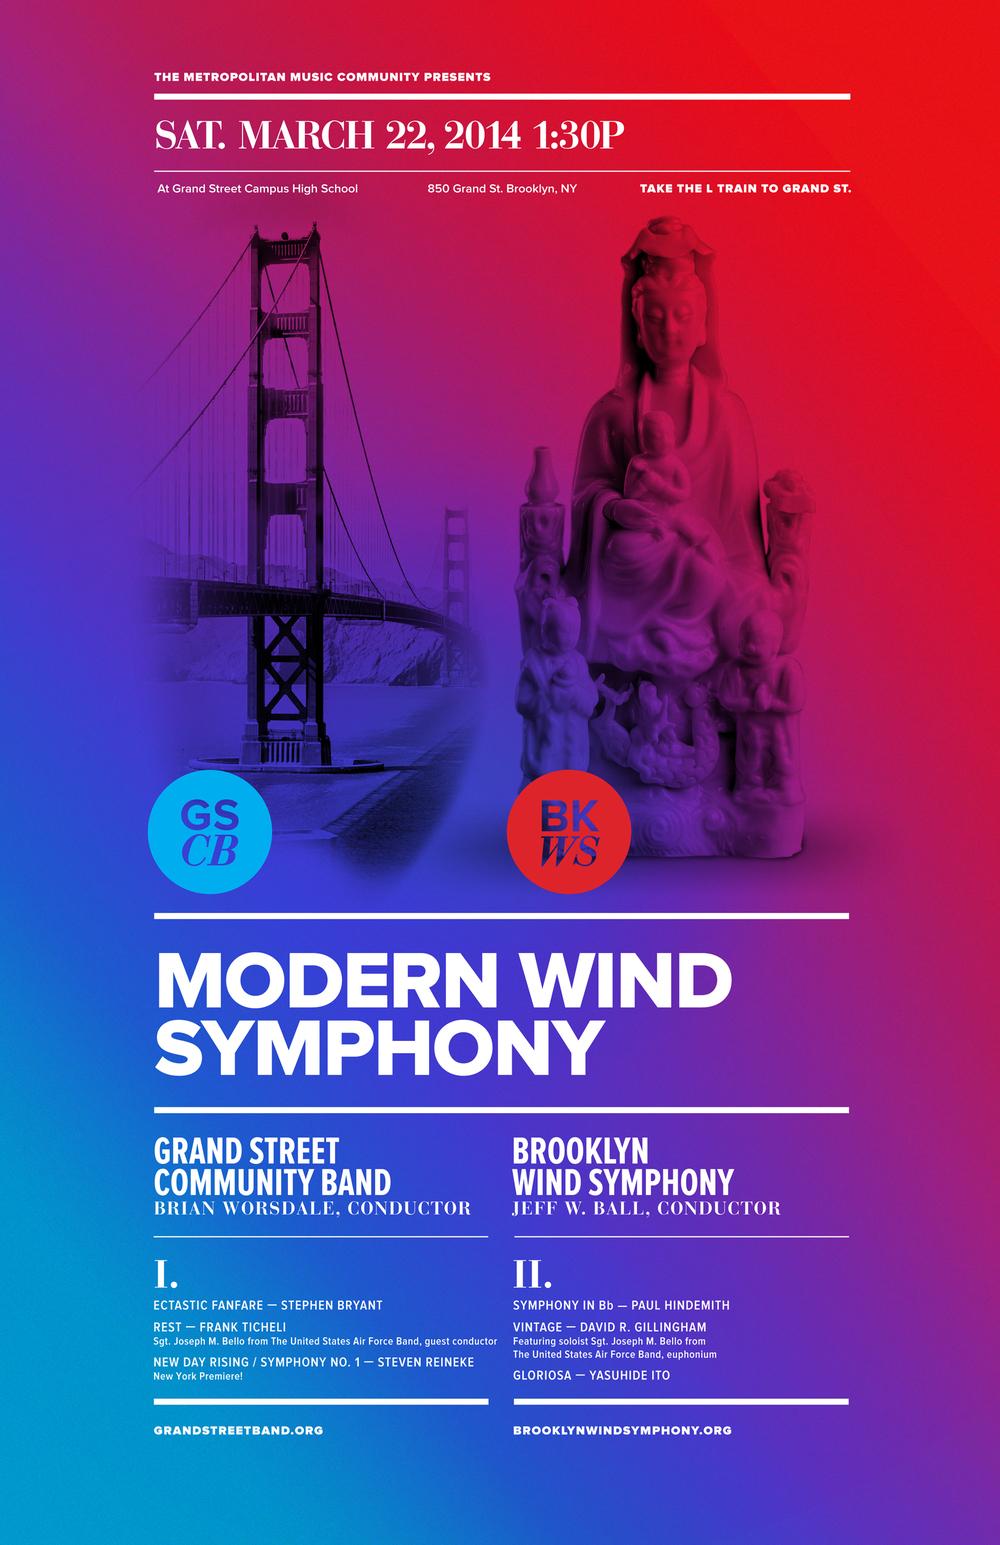 Modern_Wind_Symph_Concert-Poster-140322.jpg